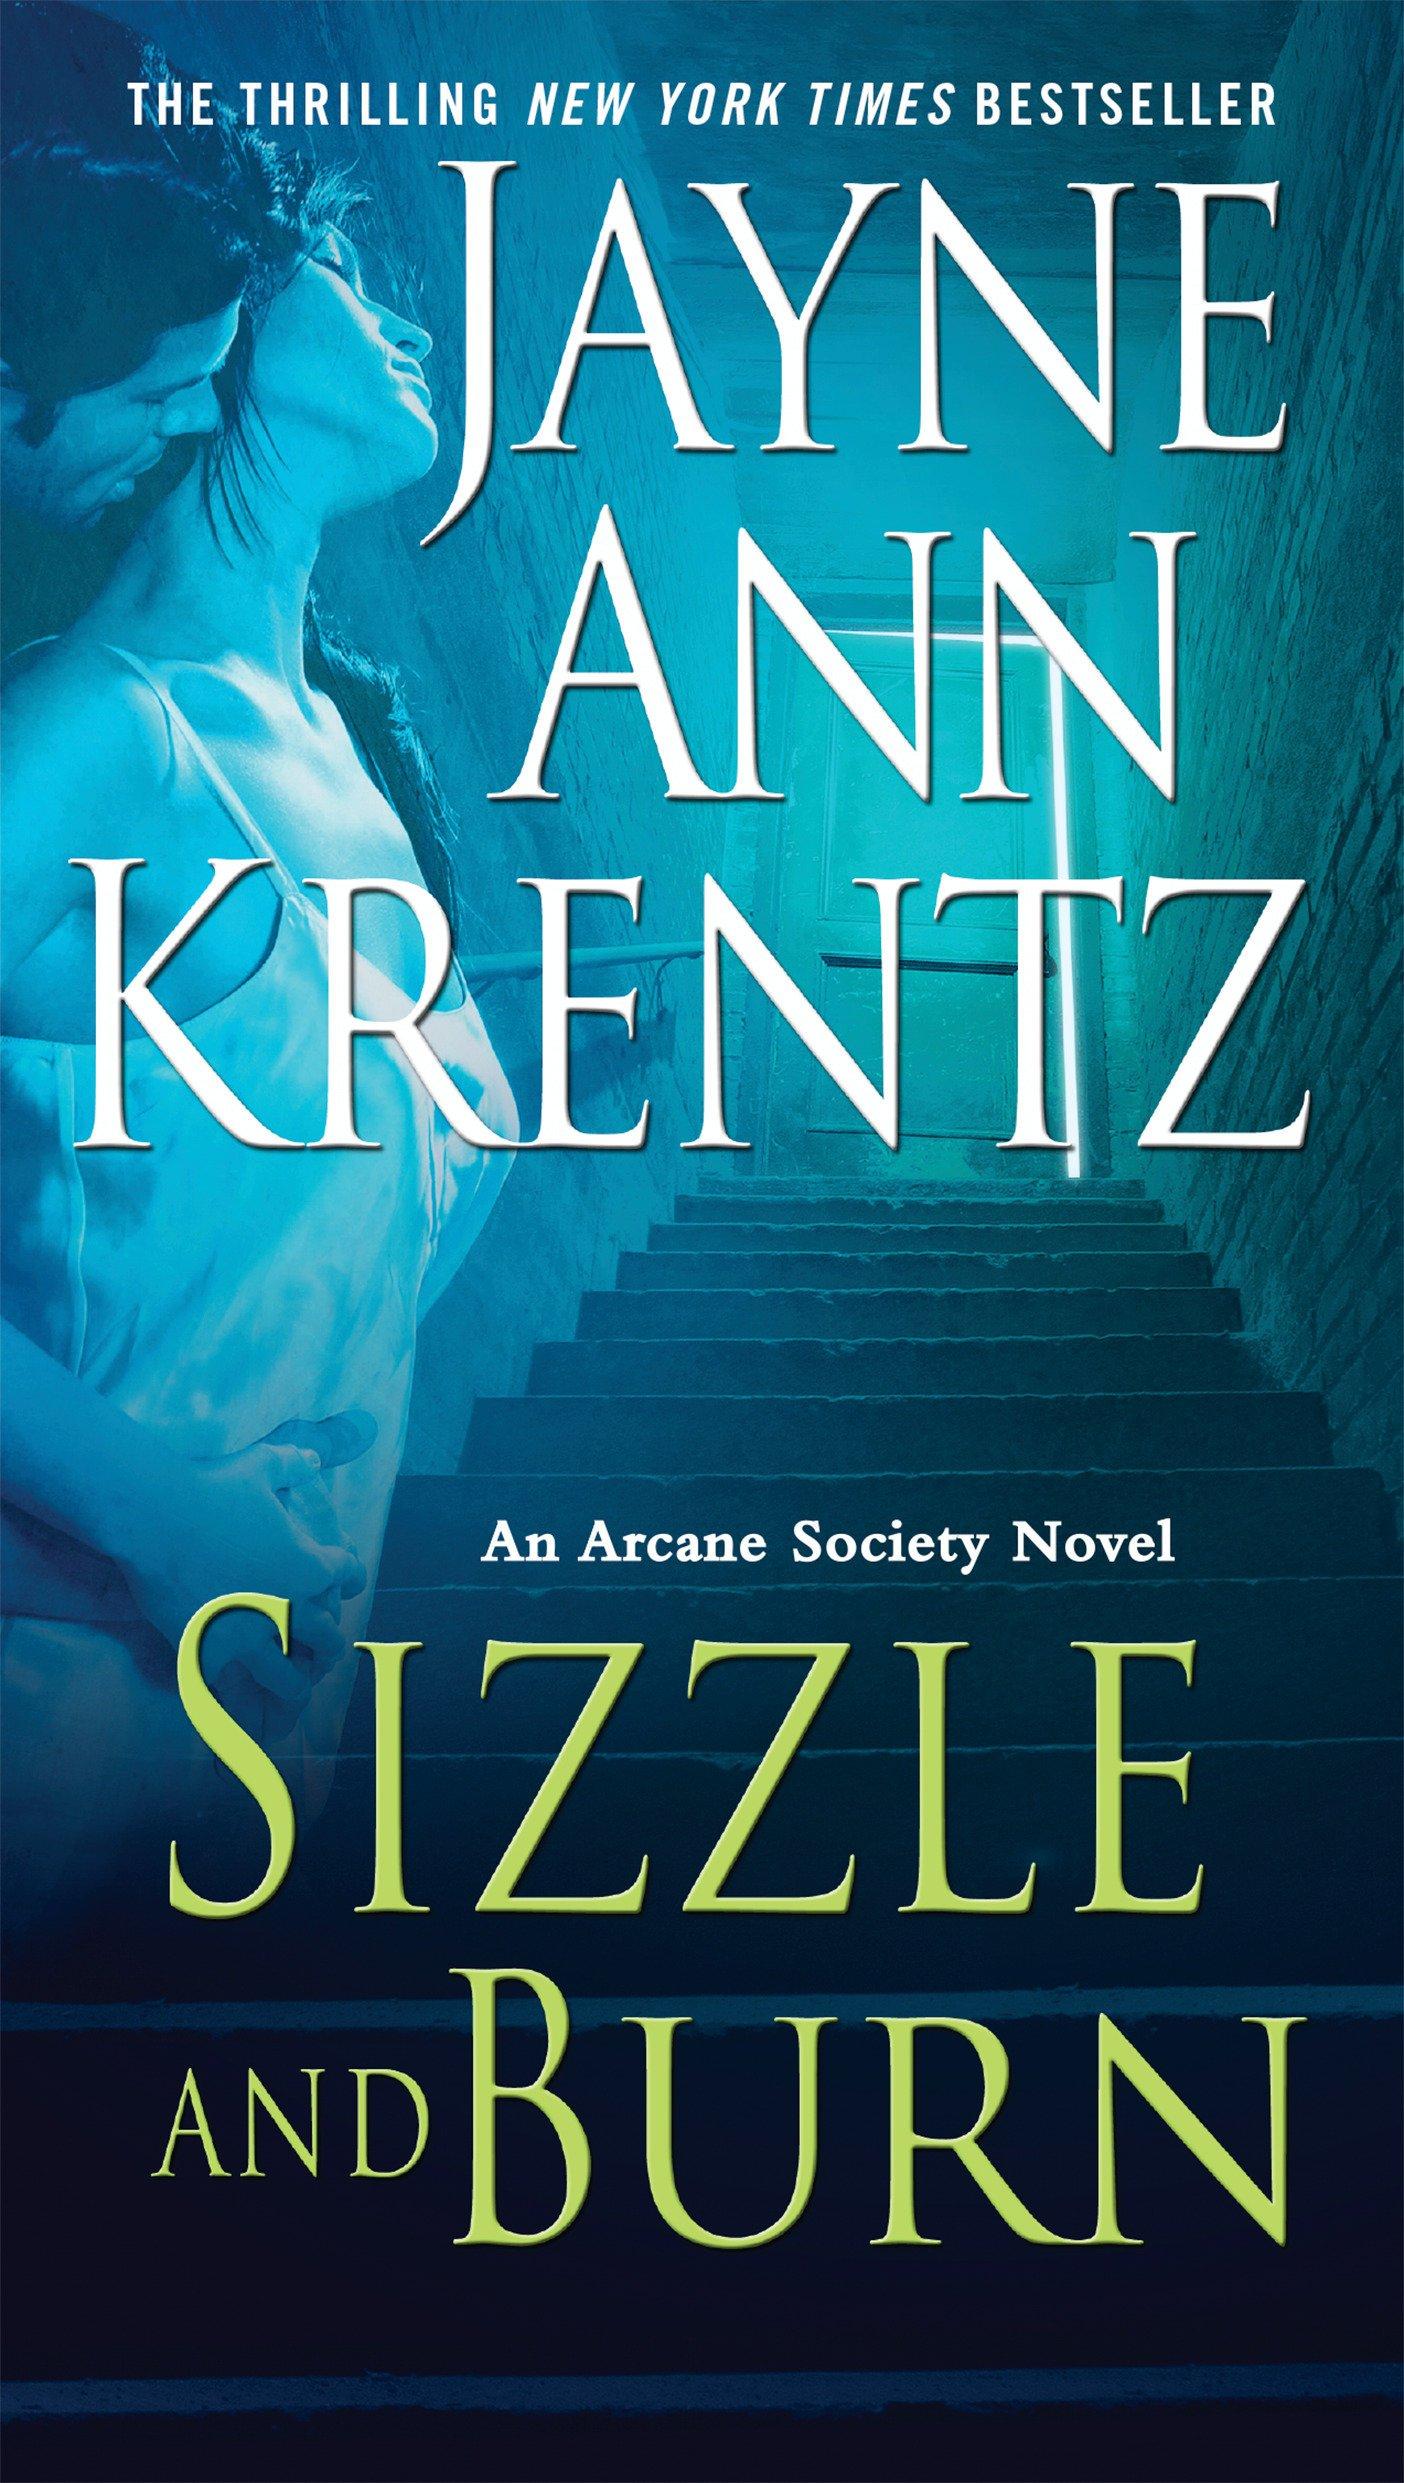 Amazon.com: Sizzle and Burn (Arcane Society, Book 3) (9780515145816): Jayne  Ann Krentz: Books